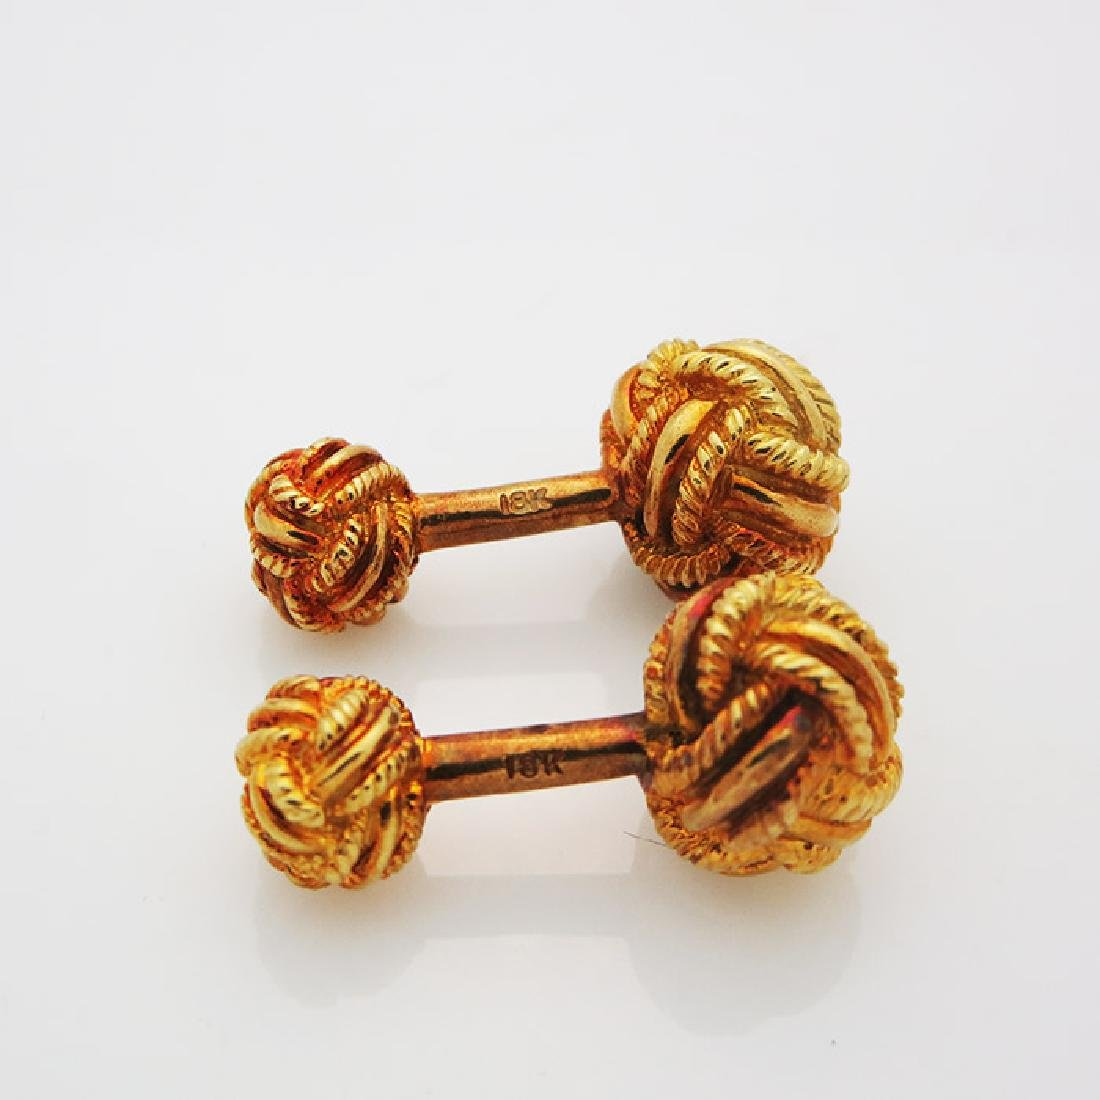 18k Yellow Gold Cuff links